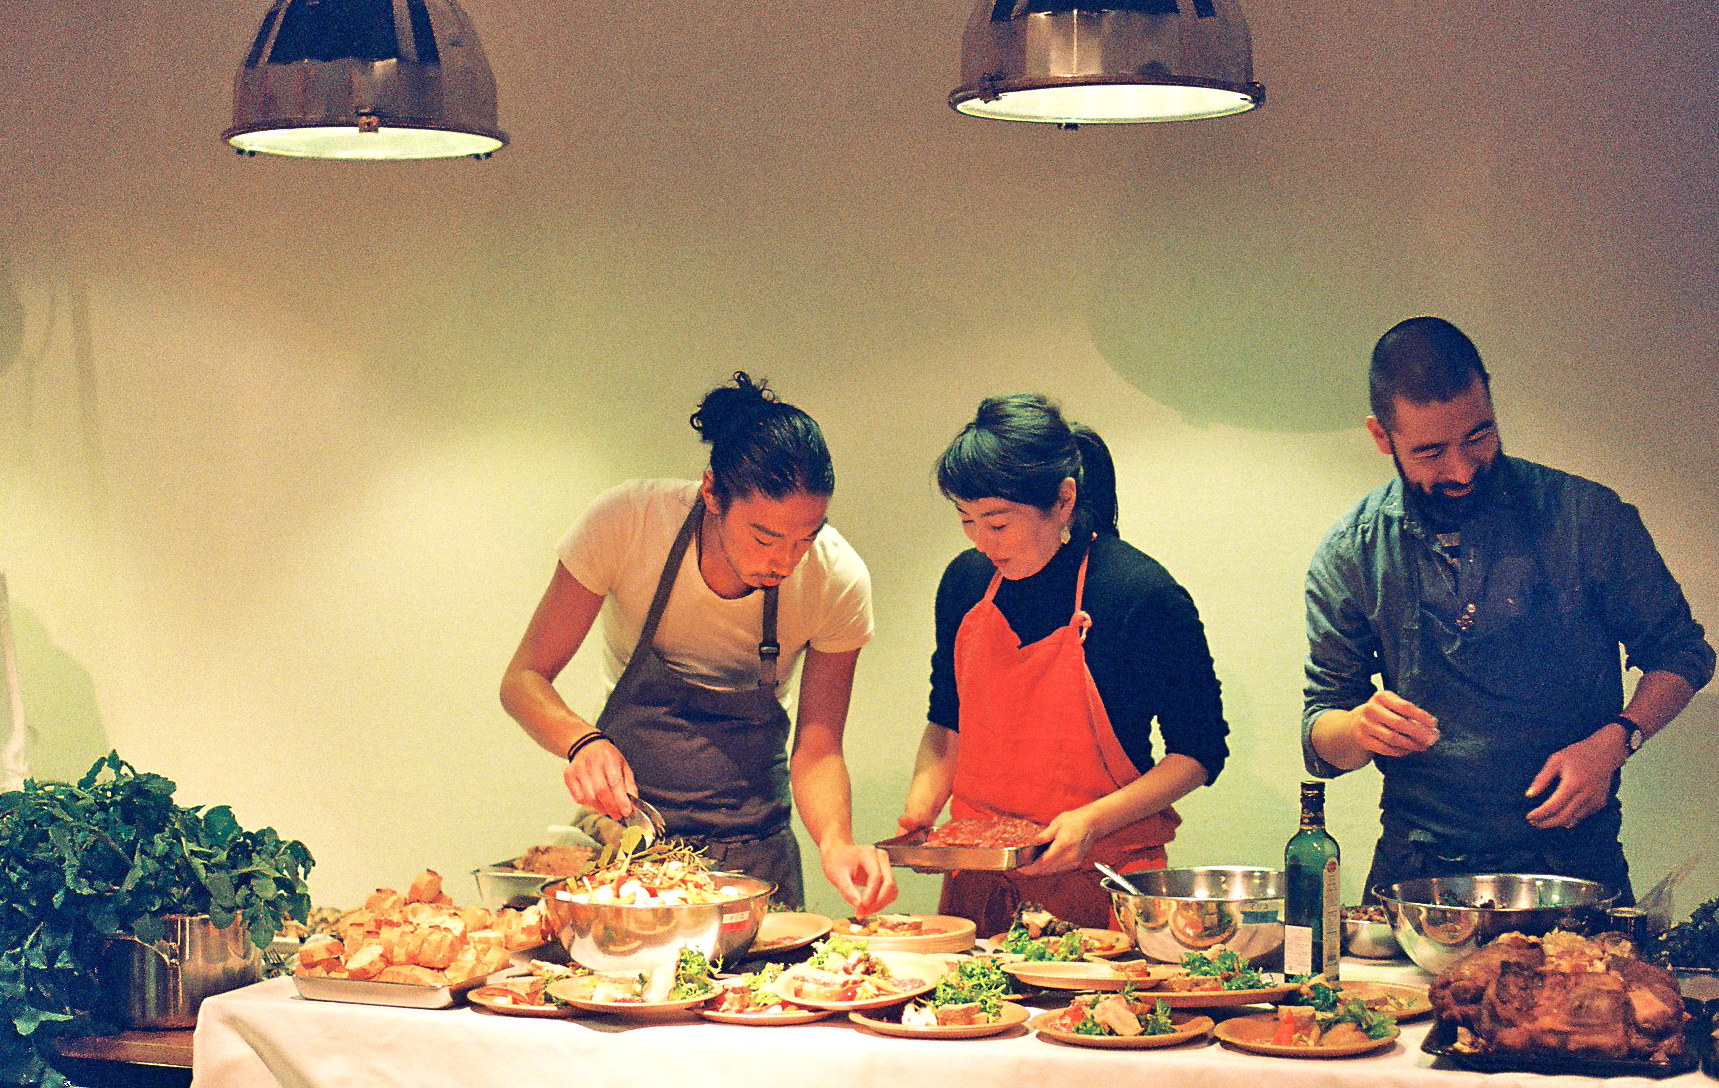 eatripによる素敵な空間でのNomadicの料理  人たちの準備のひとコマ。